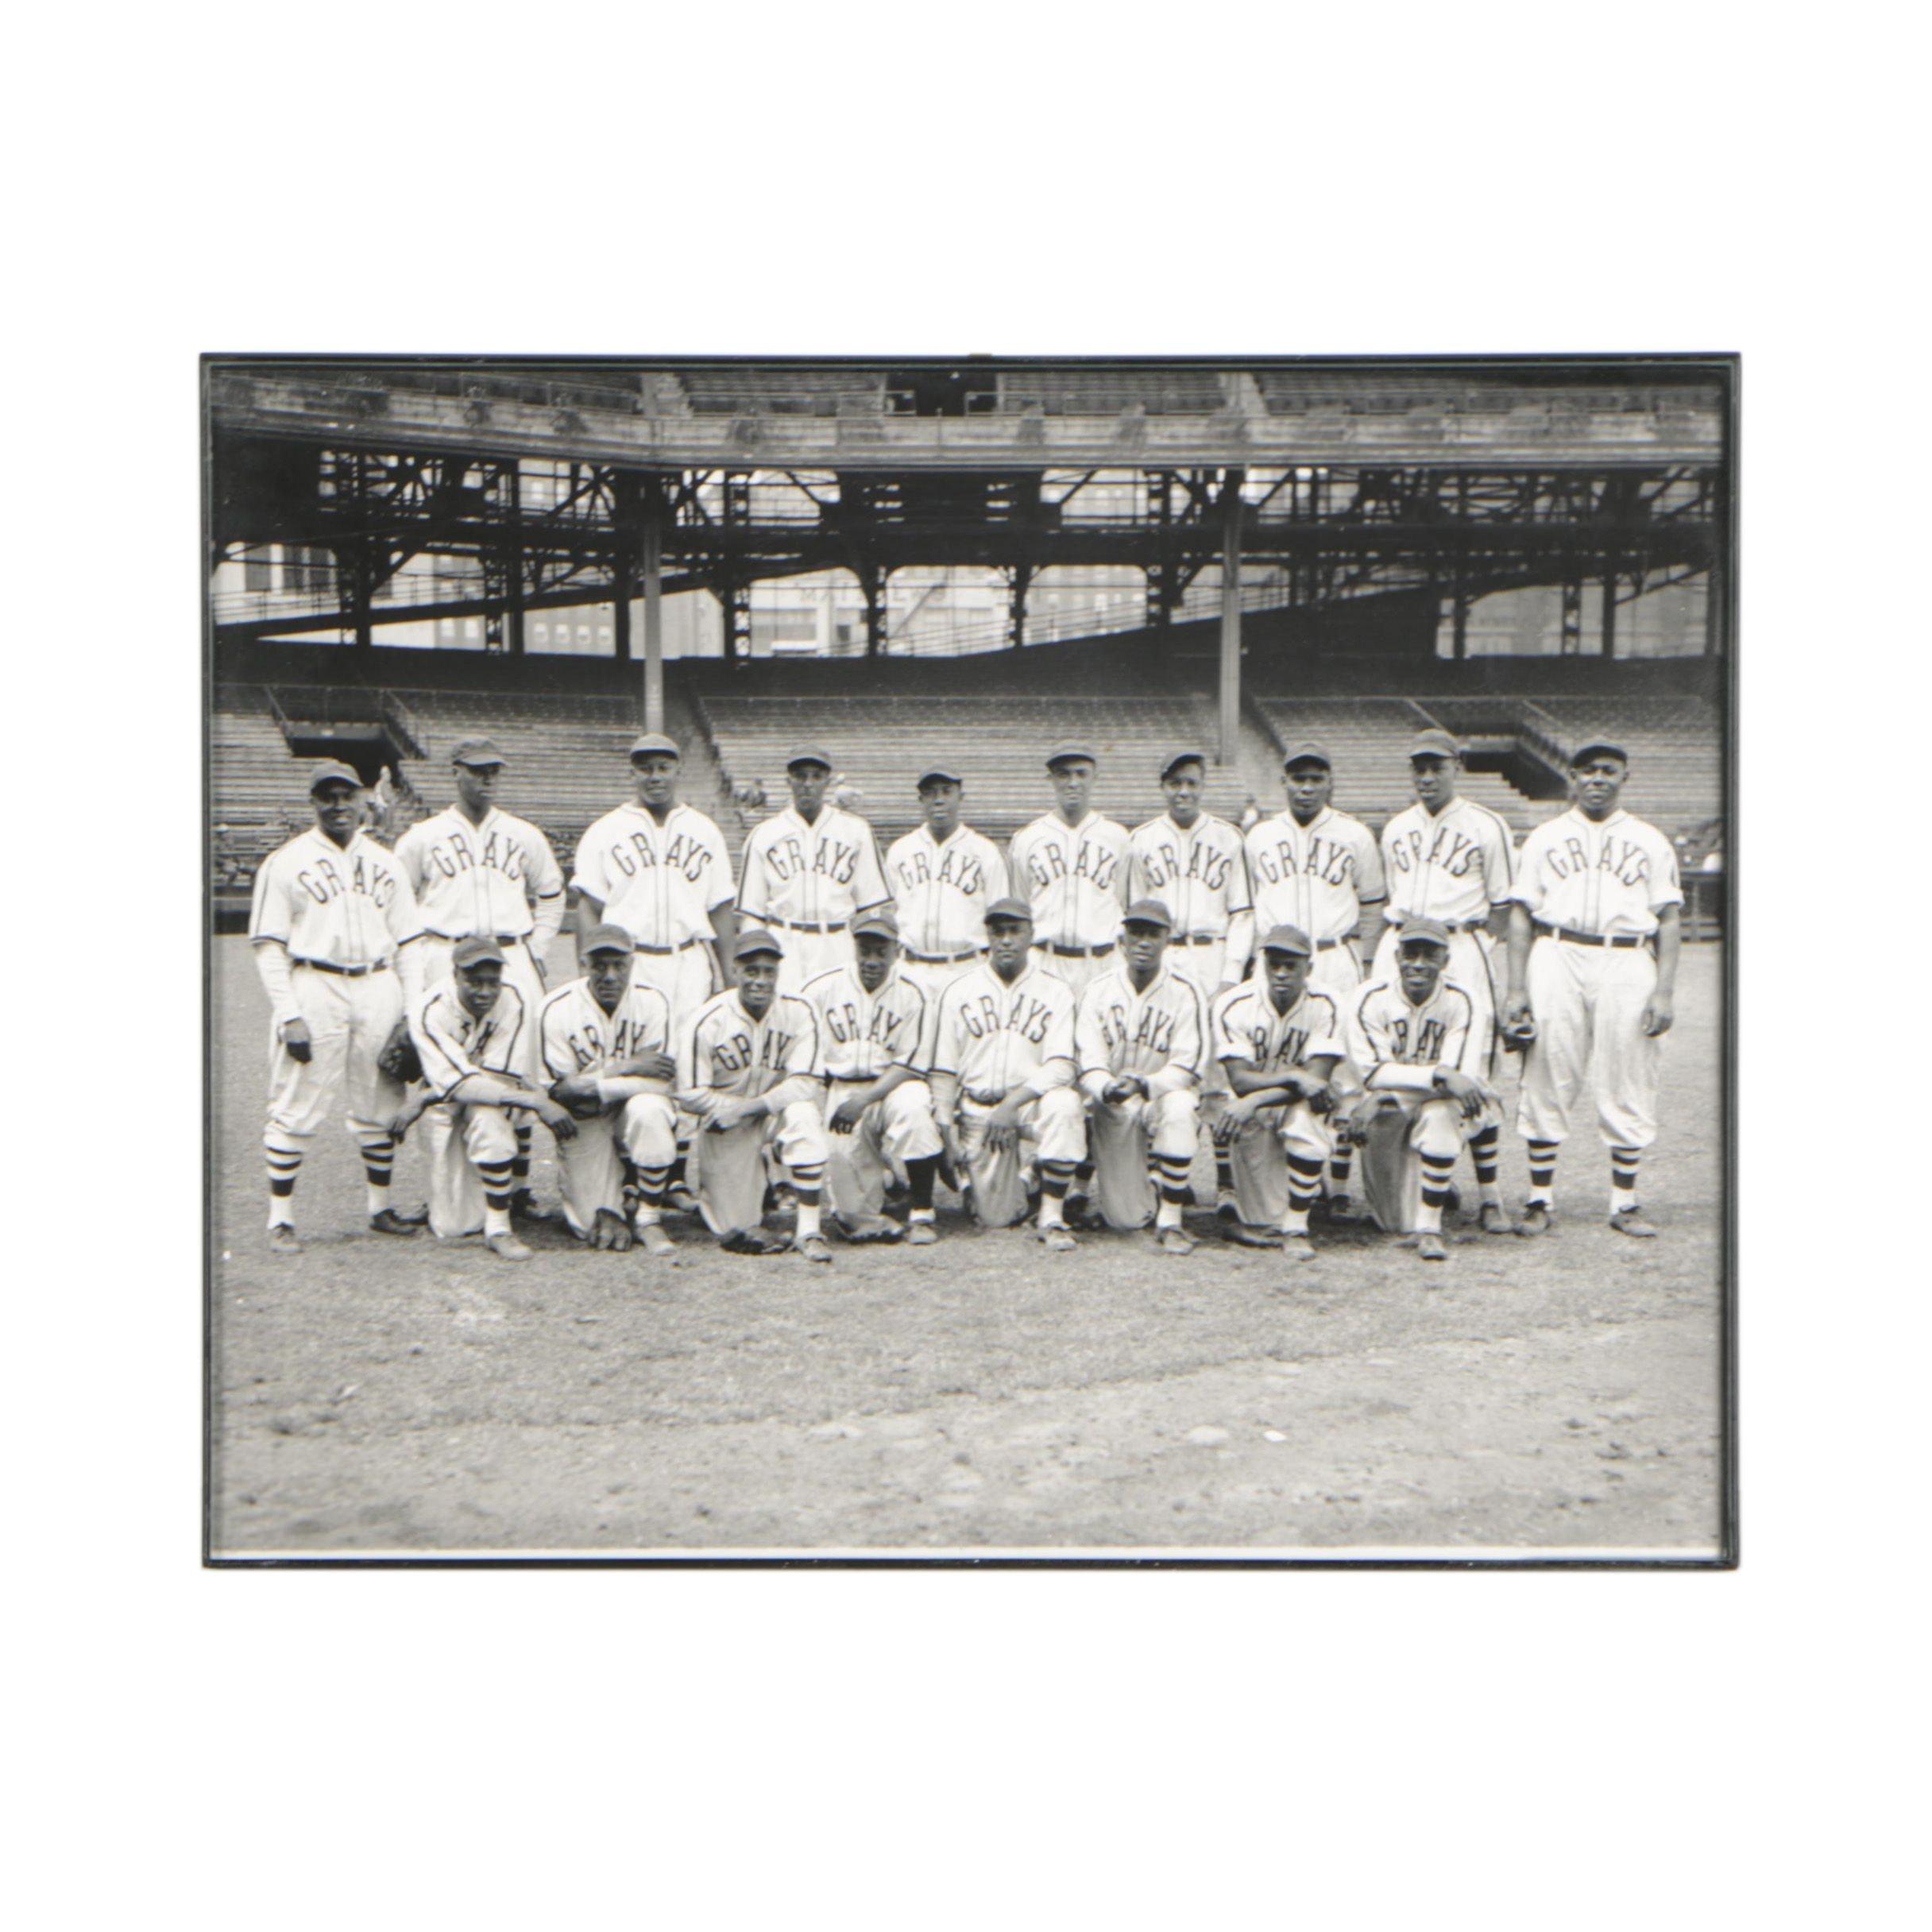 Team Photograph of the Homestead Grays